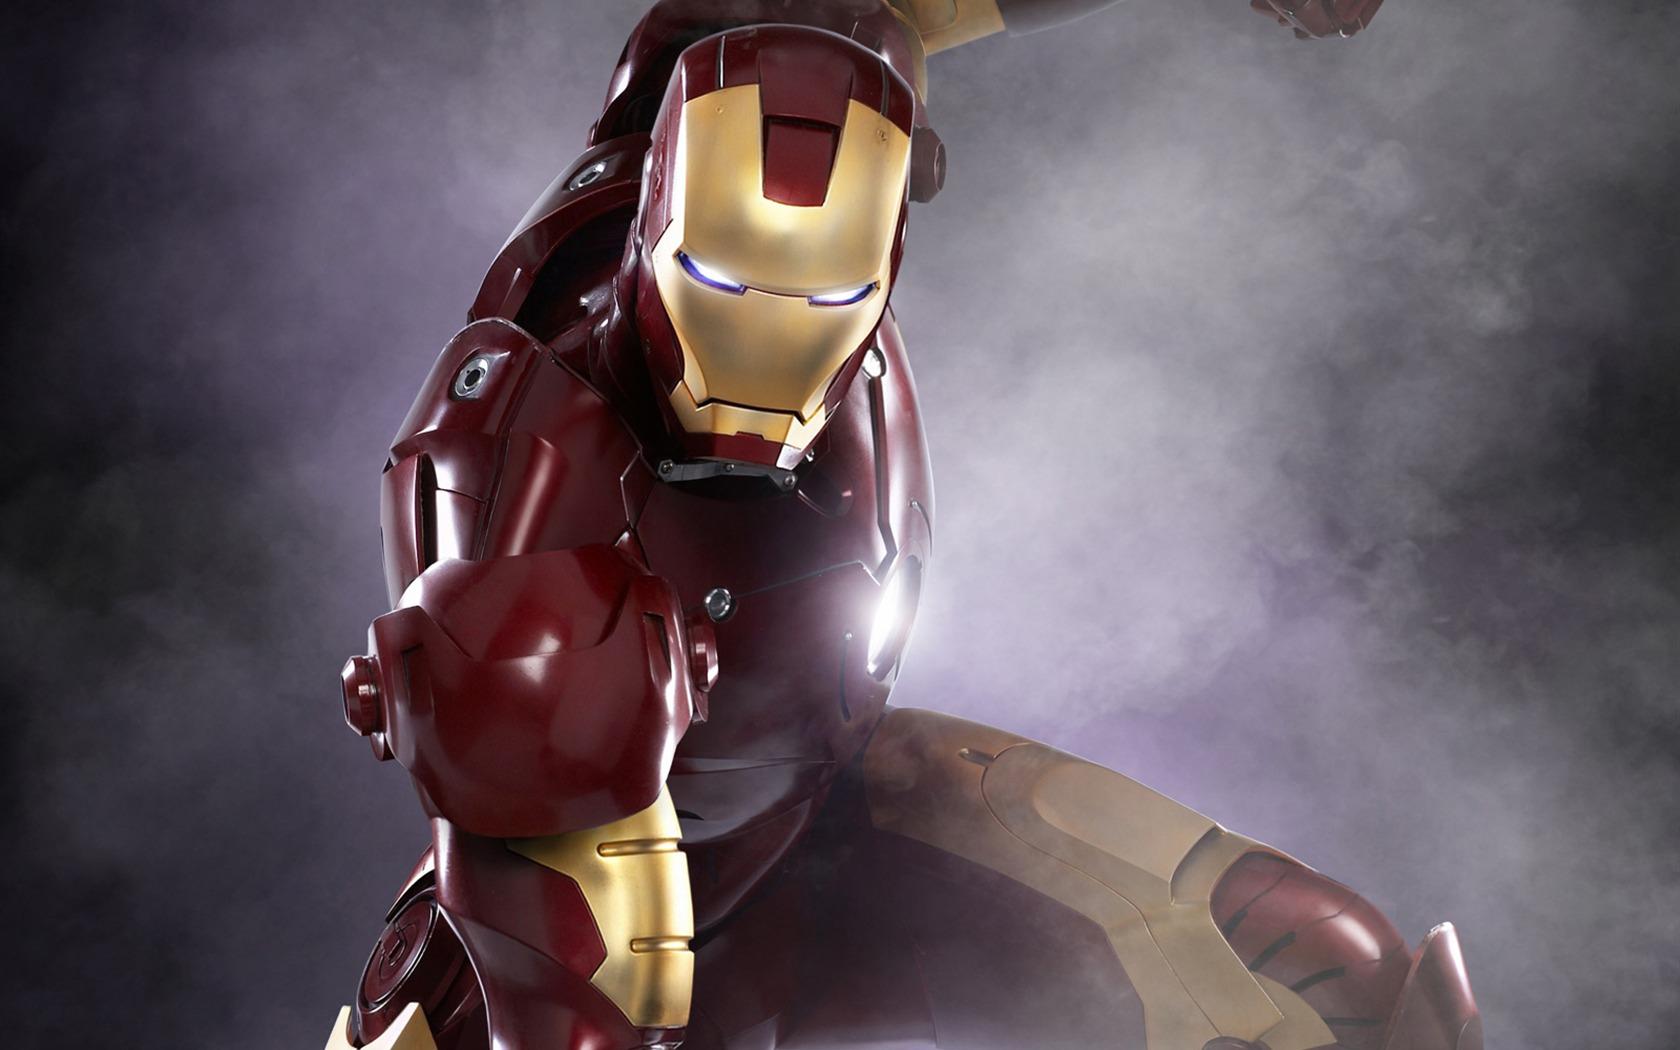 2013 iron man 3 movie hd desktop wallpaper 06 preview | 10wallpaper